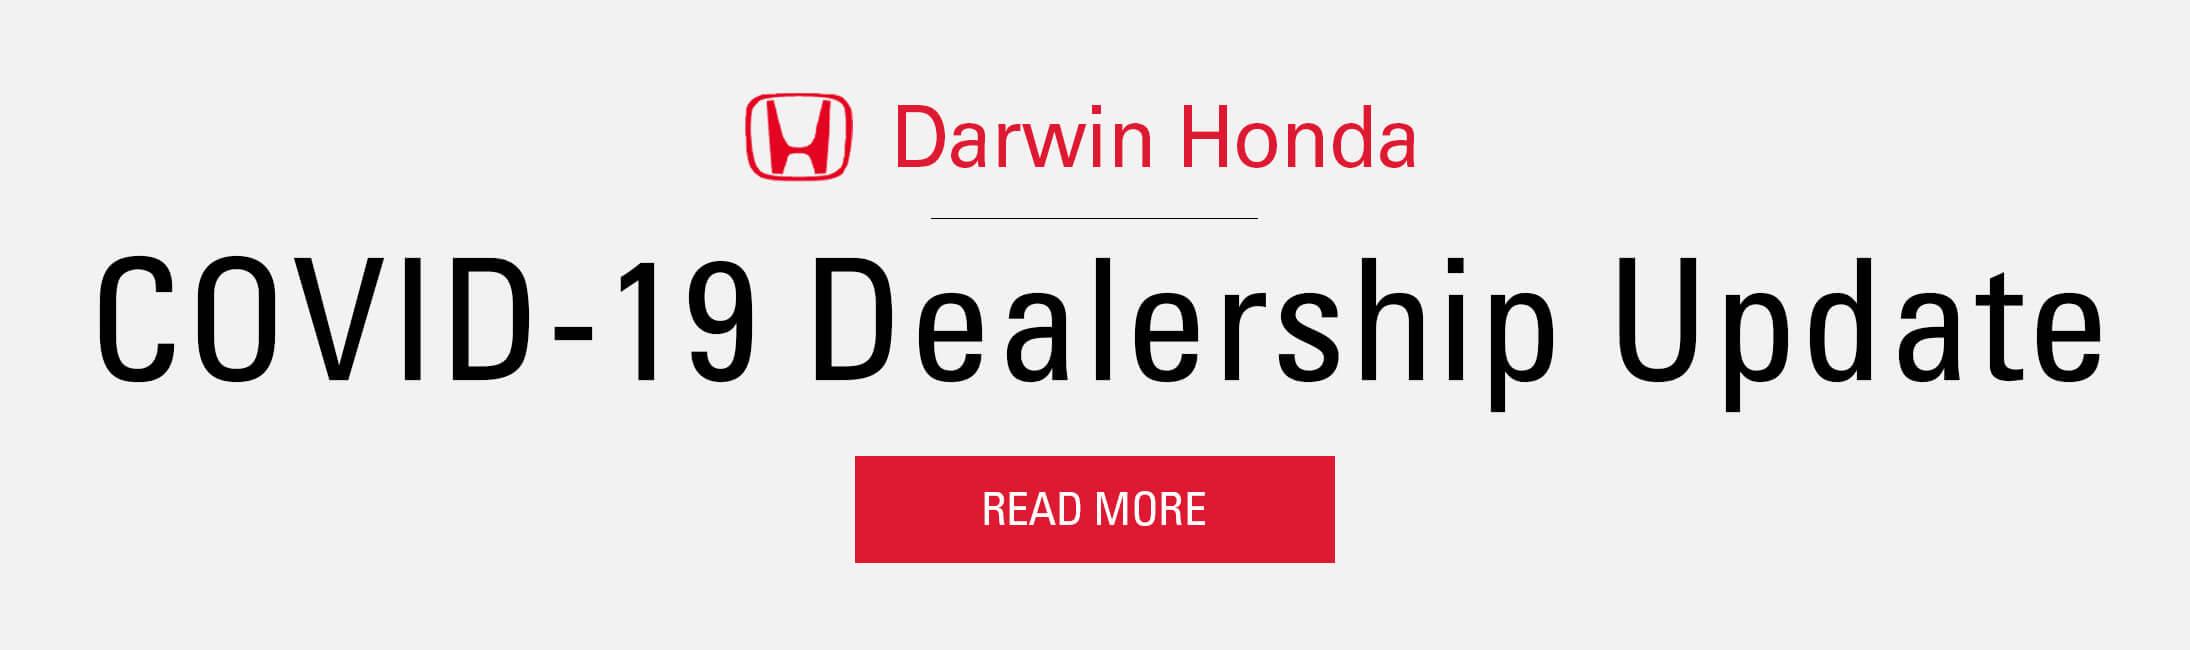 Darwin Honda COVID-19 Statement